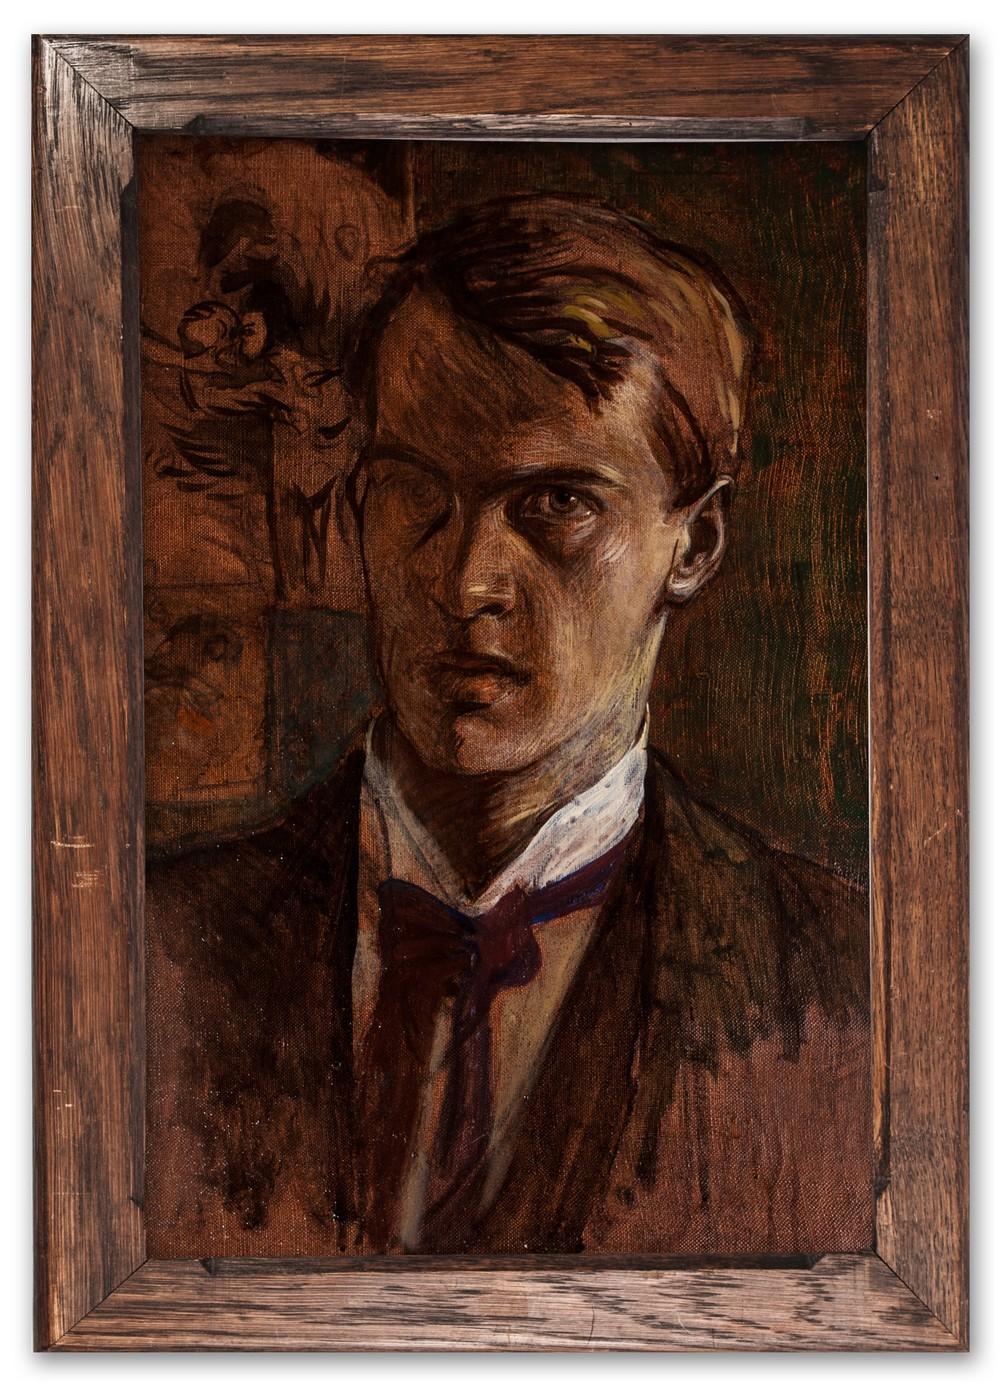 Paul Larsson Palm, (Swedish 1876-1899), Self-portrait, c.1897.